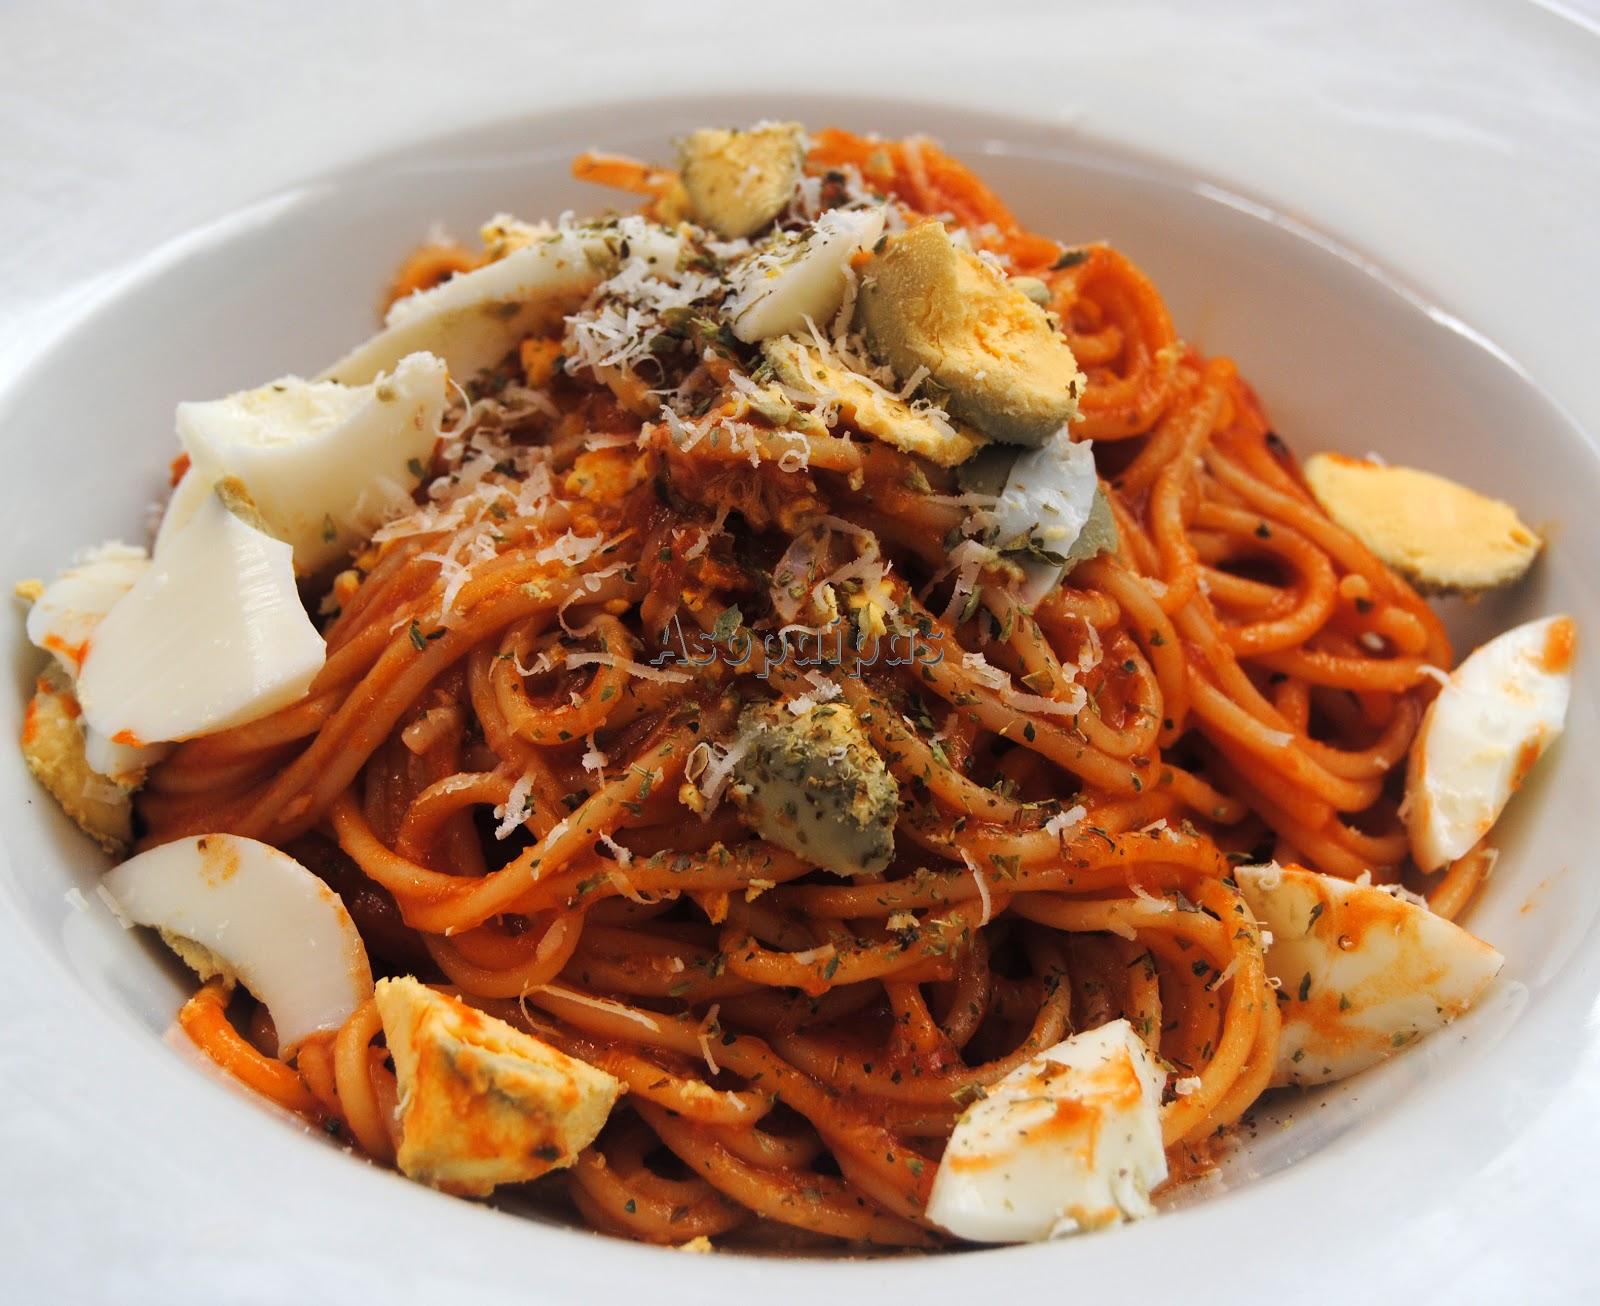 Espaguetis con at n y huevo duro receta asopaipas for Plato de espaguetis